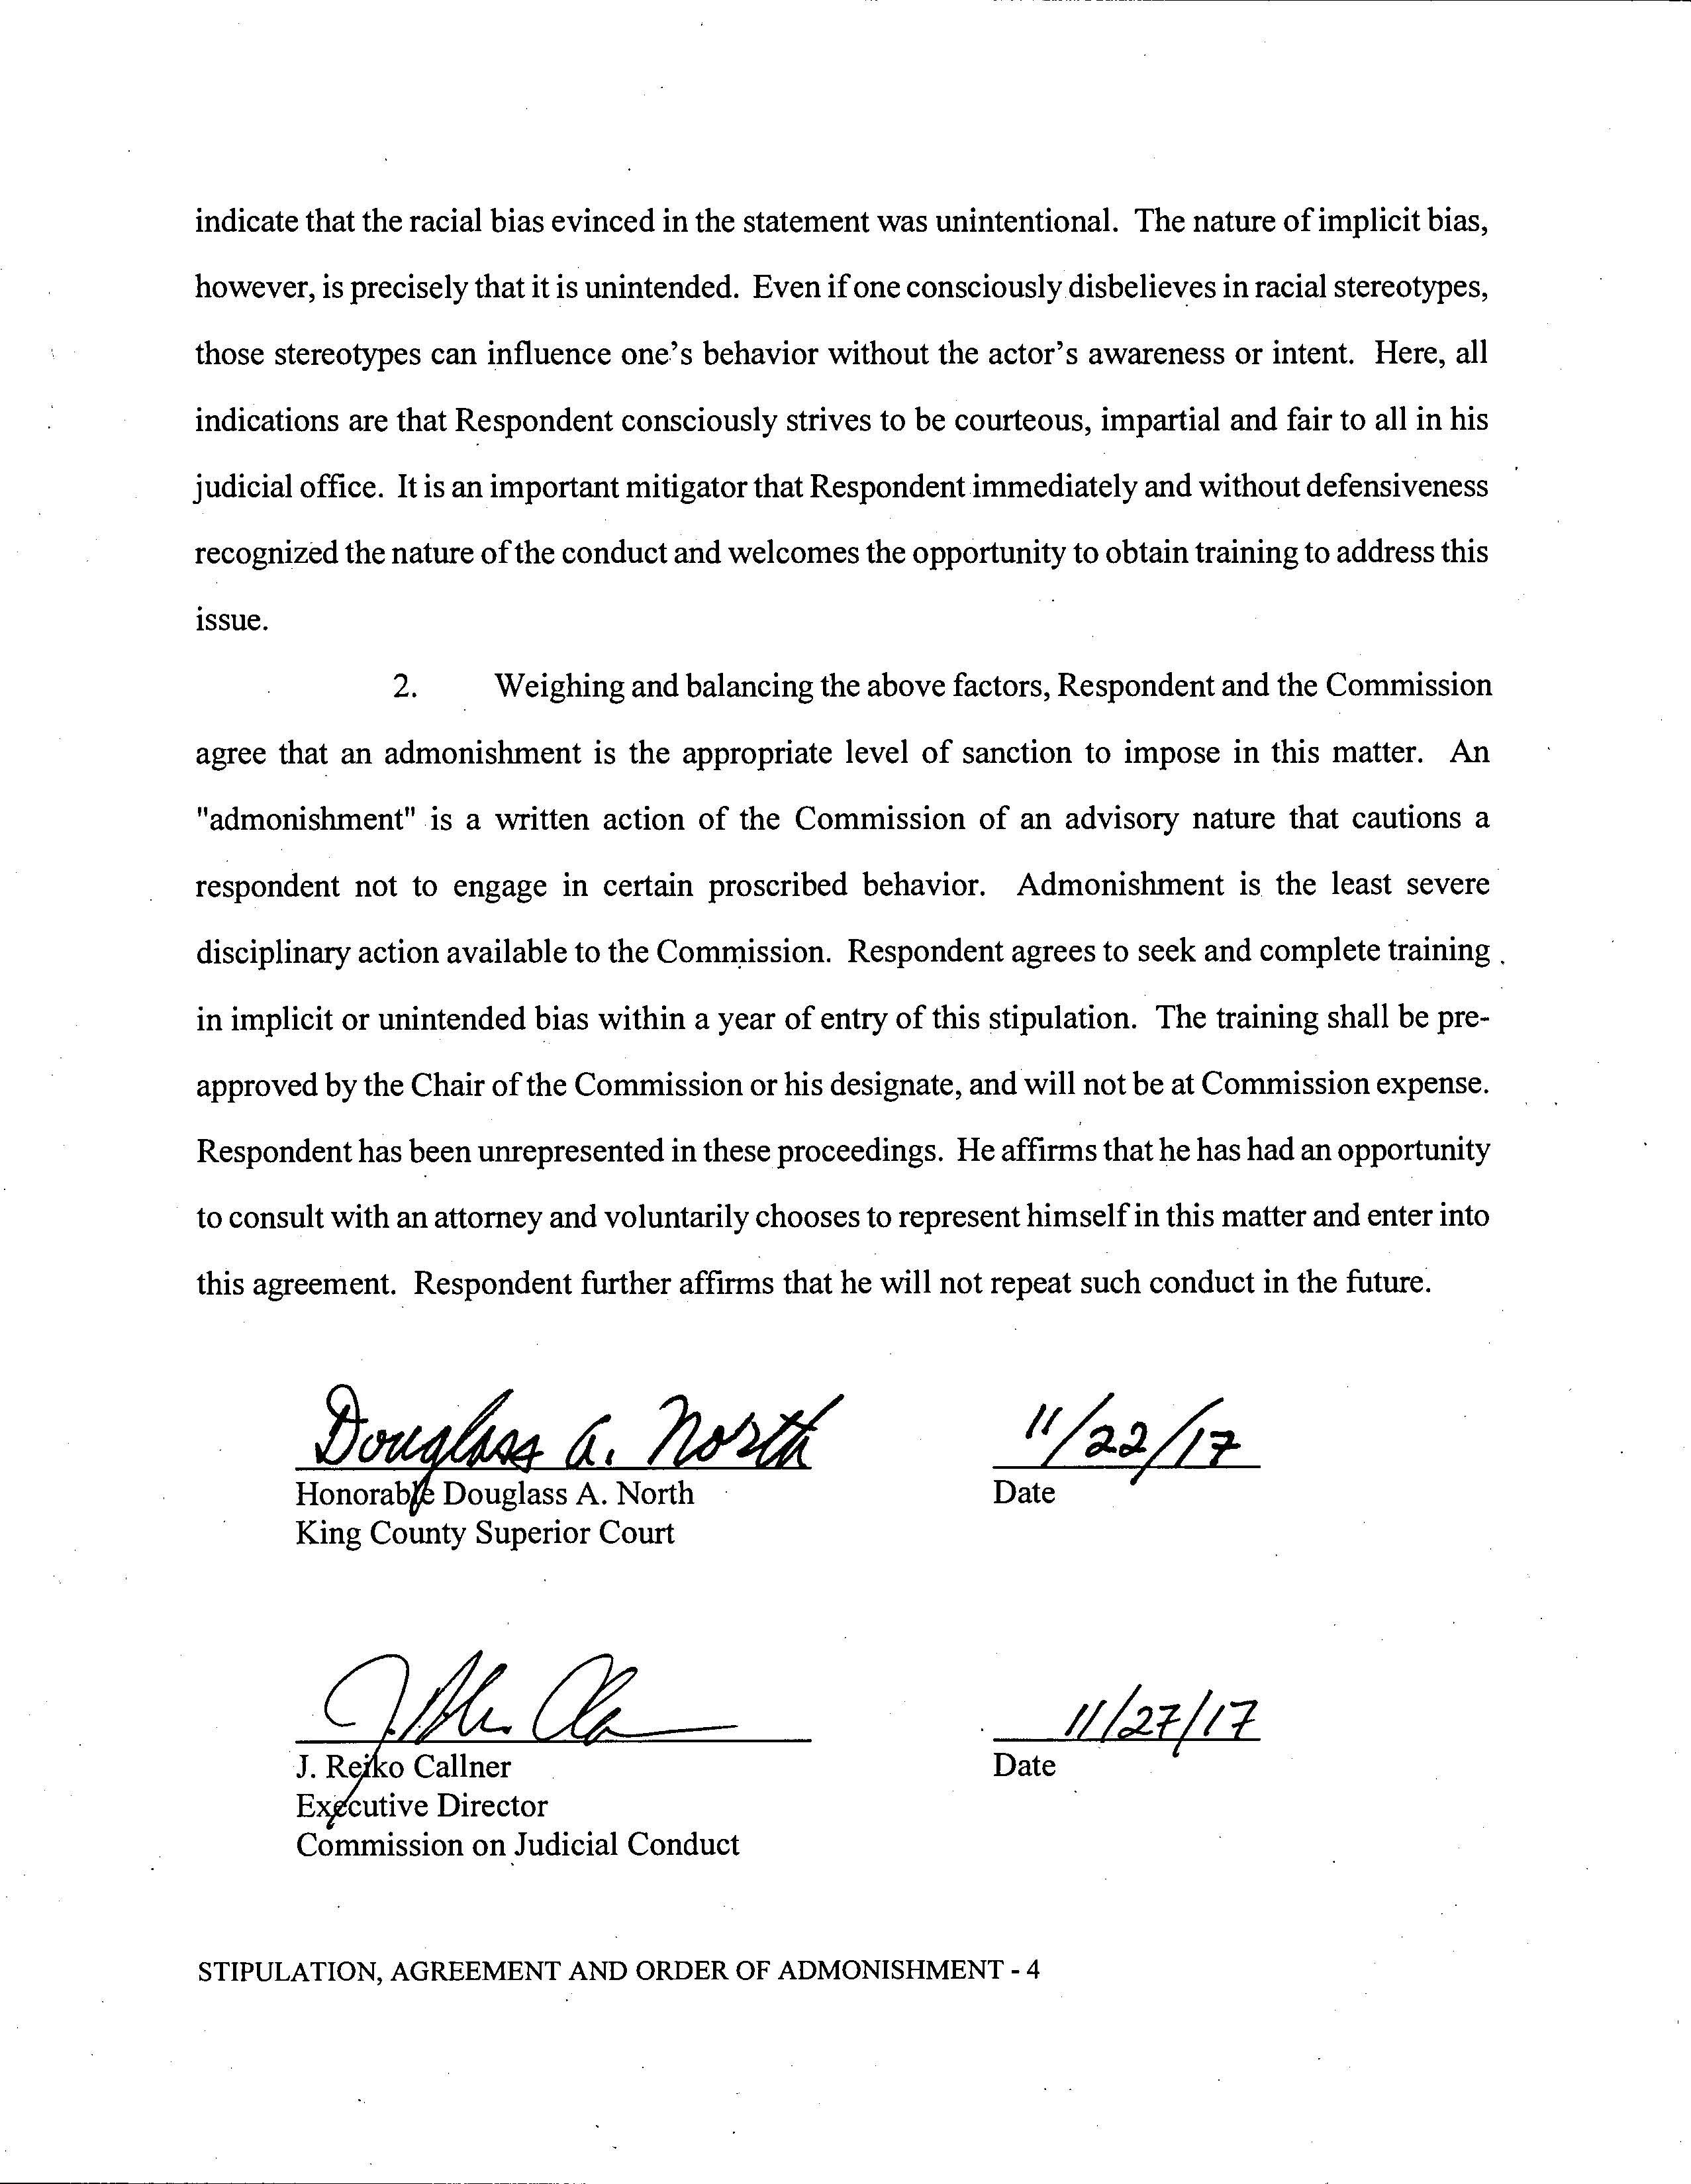 Judge Douglas North Should Resignation_Page_4